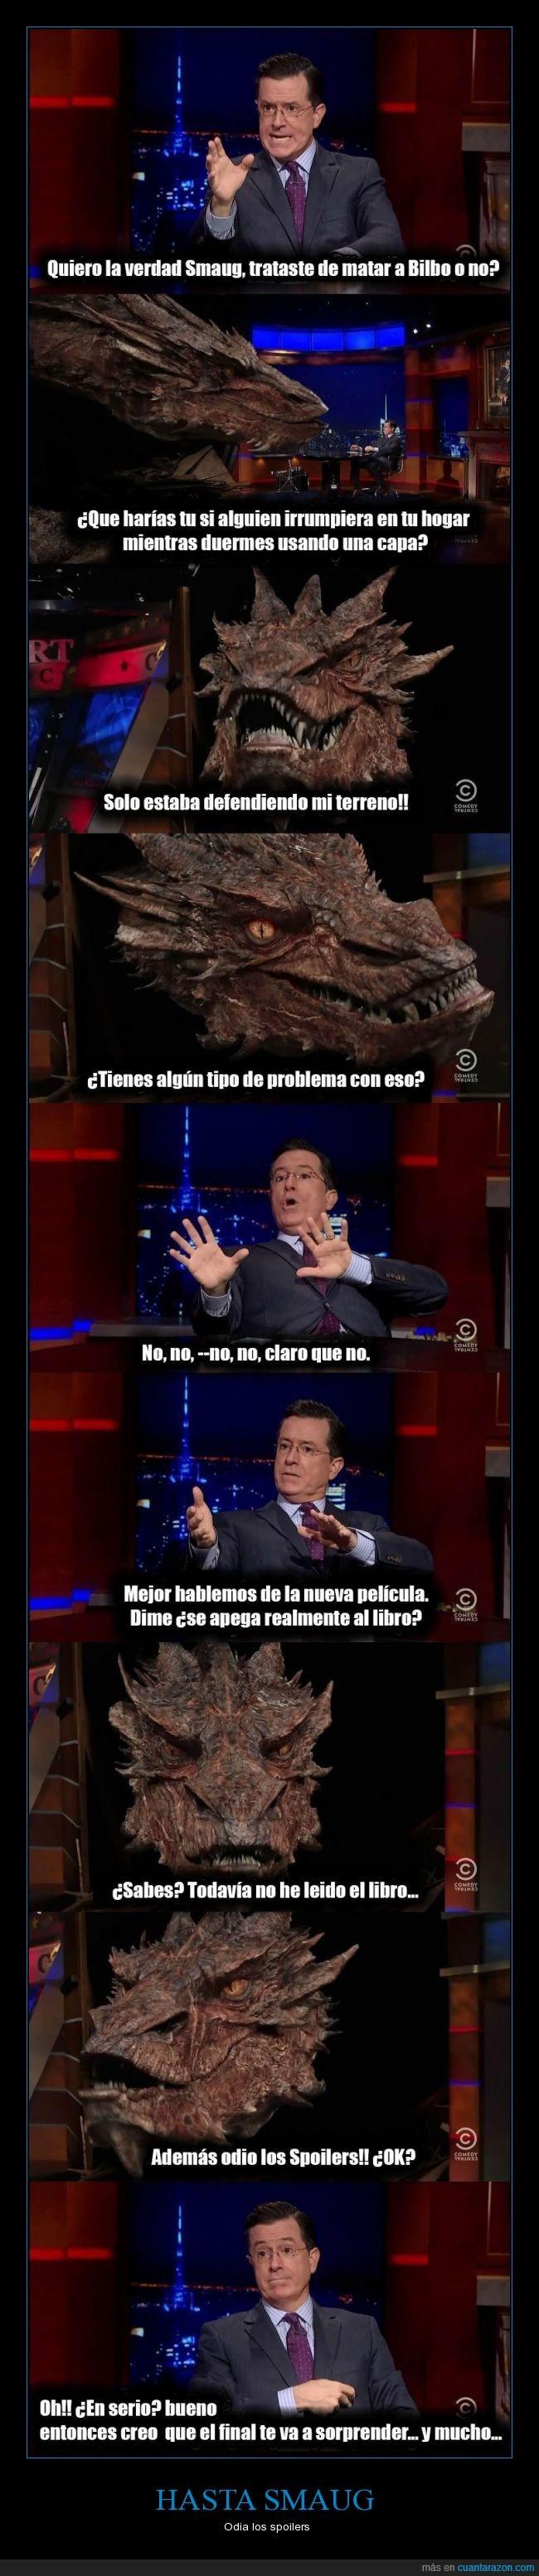 bilbo,dragón,smaug,Stephen Colbert,tv